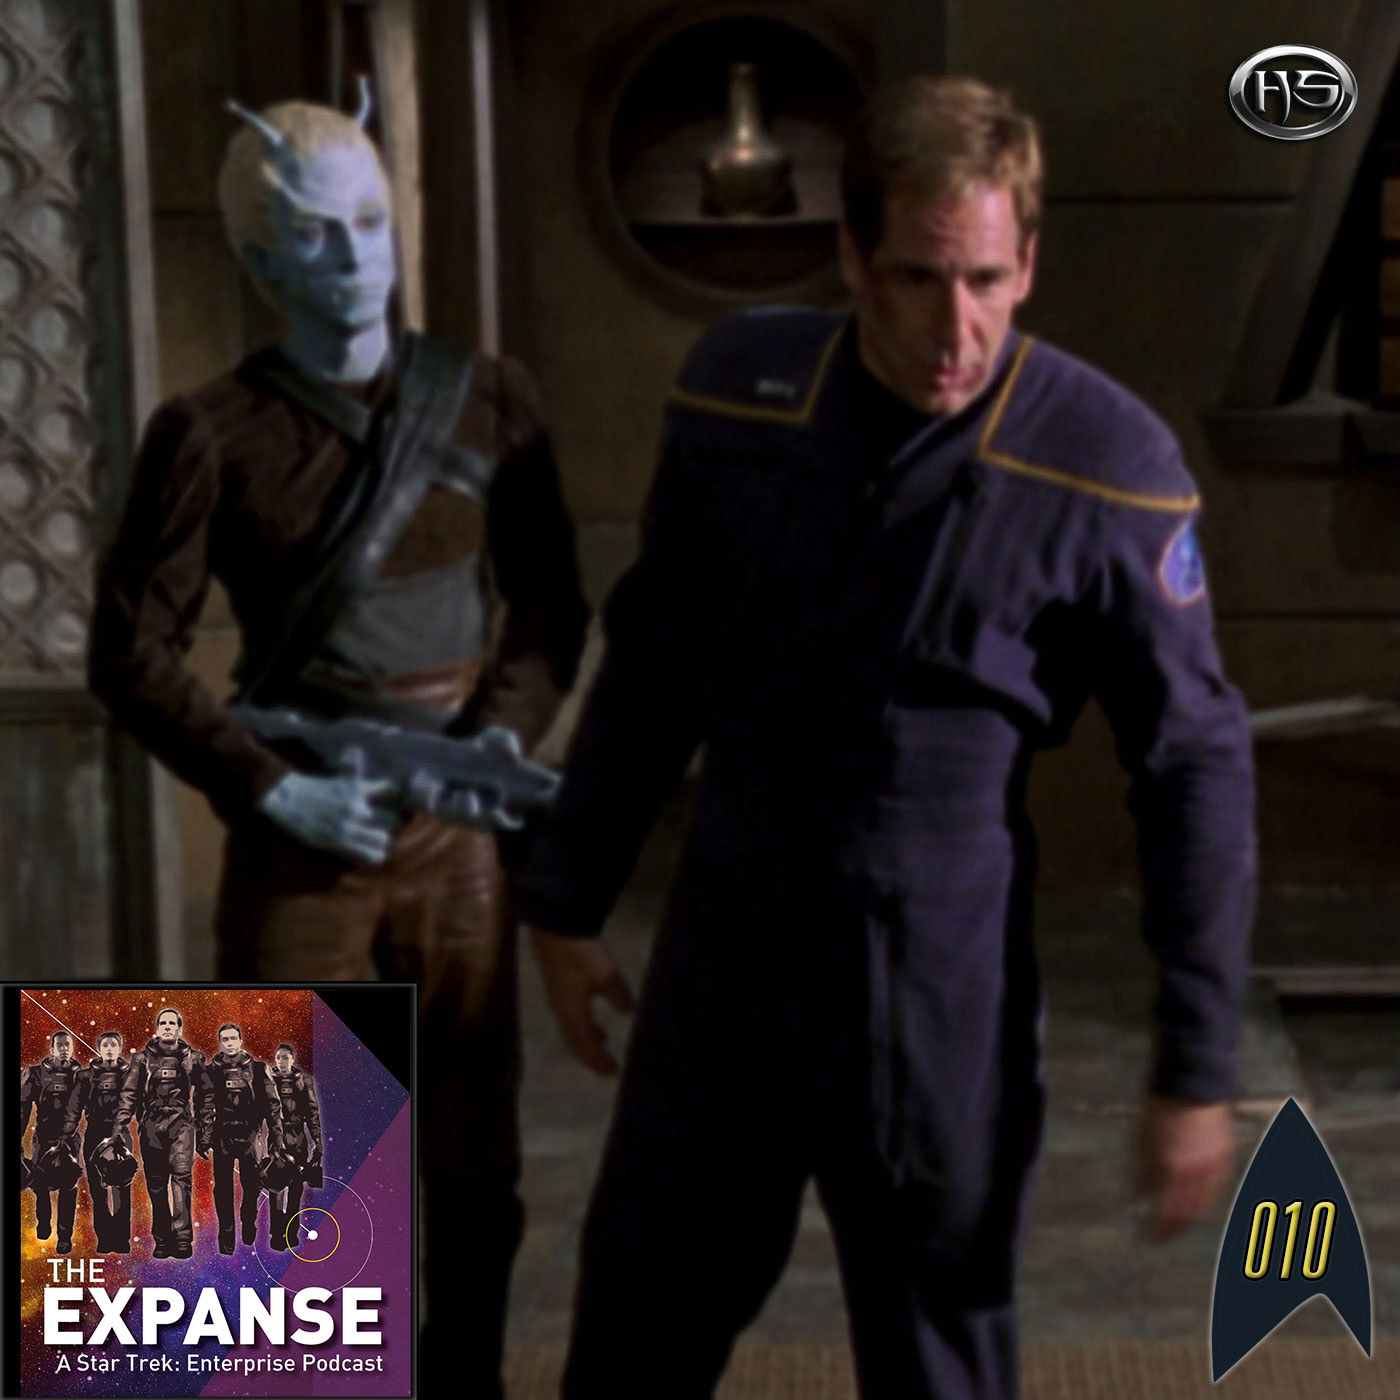 The Expanse Episode 10